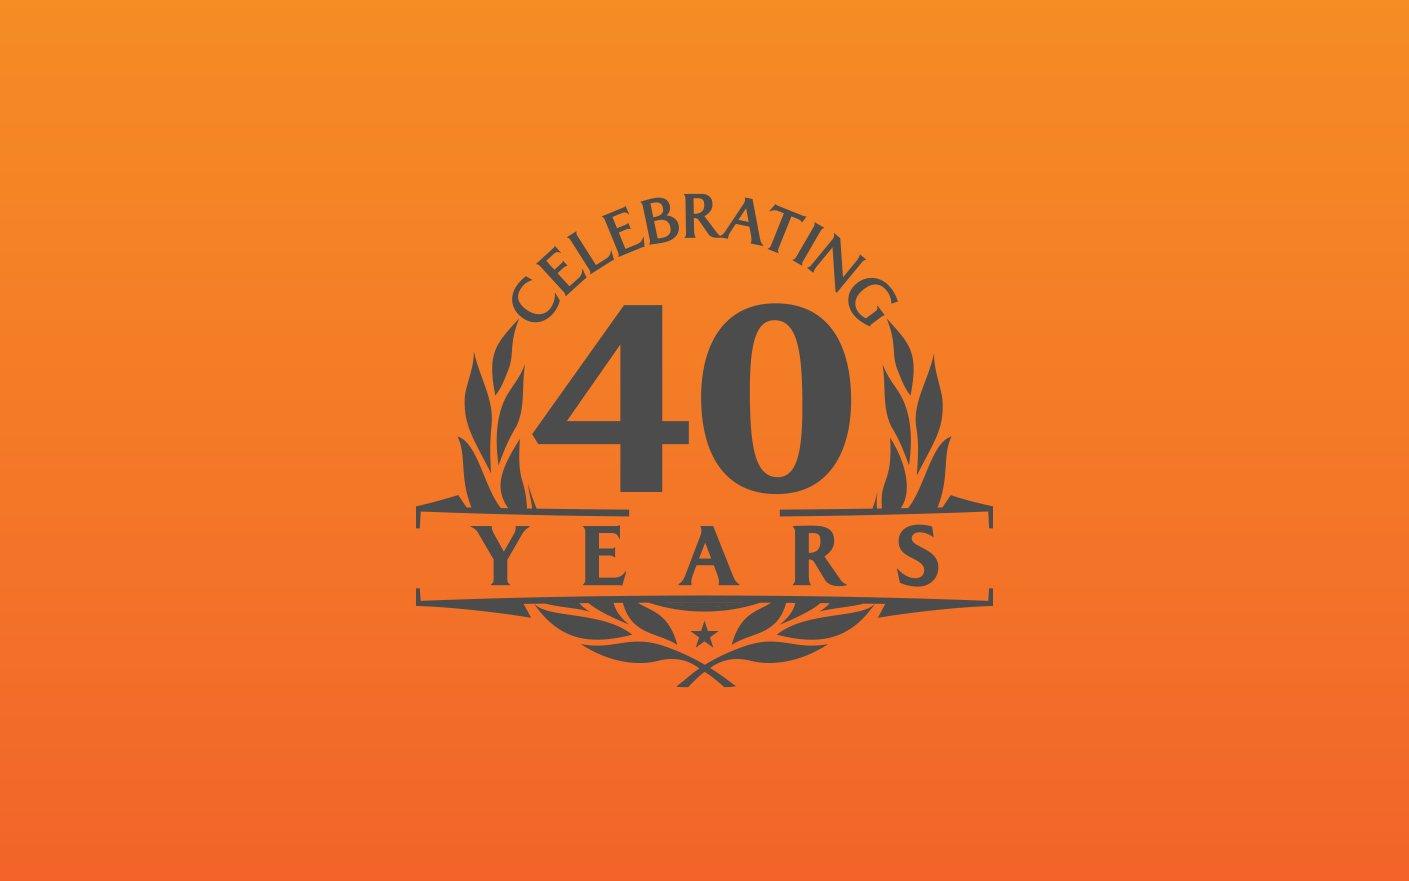 Saxon Homecare Orange Branding Anniversary